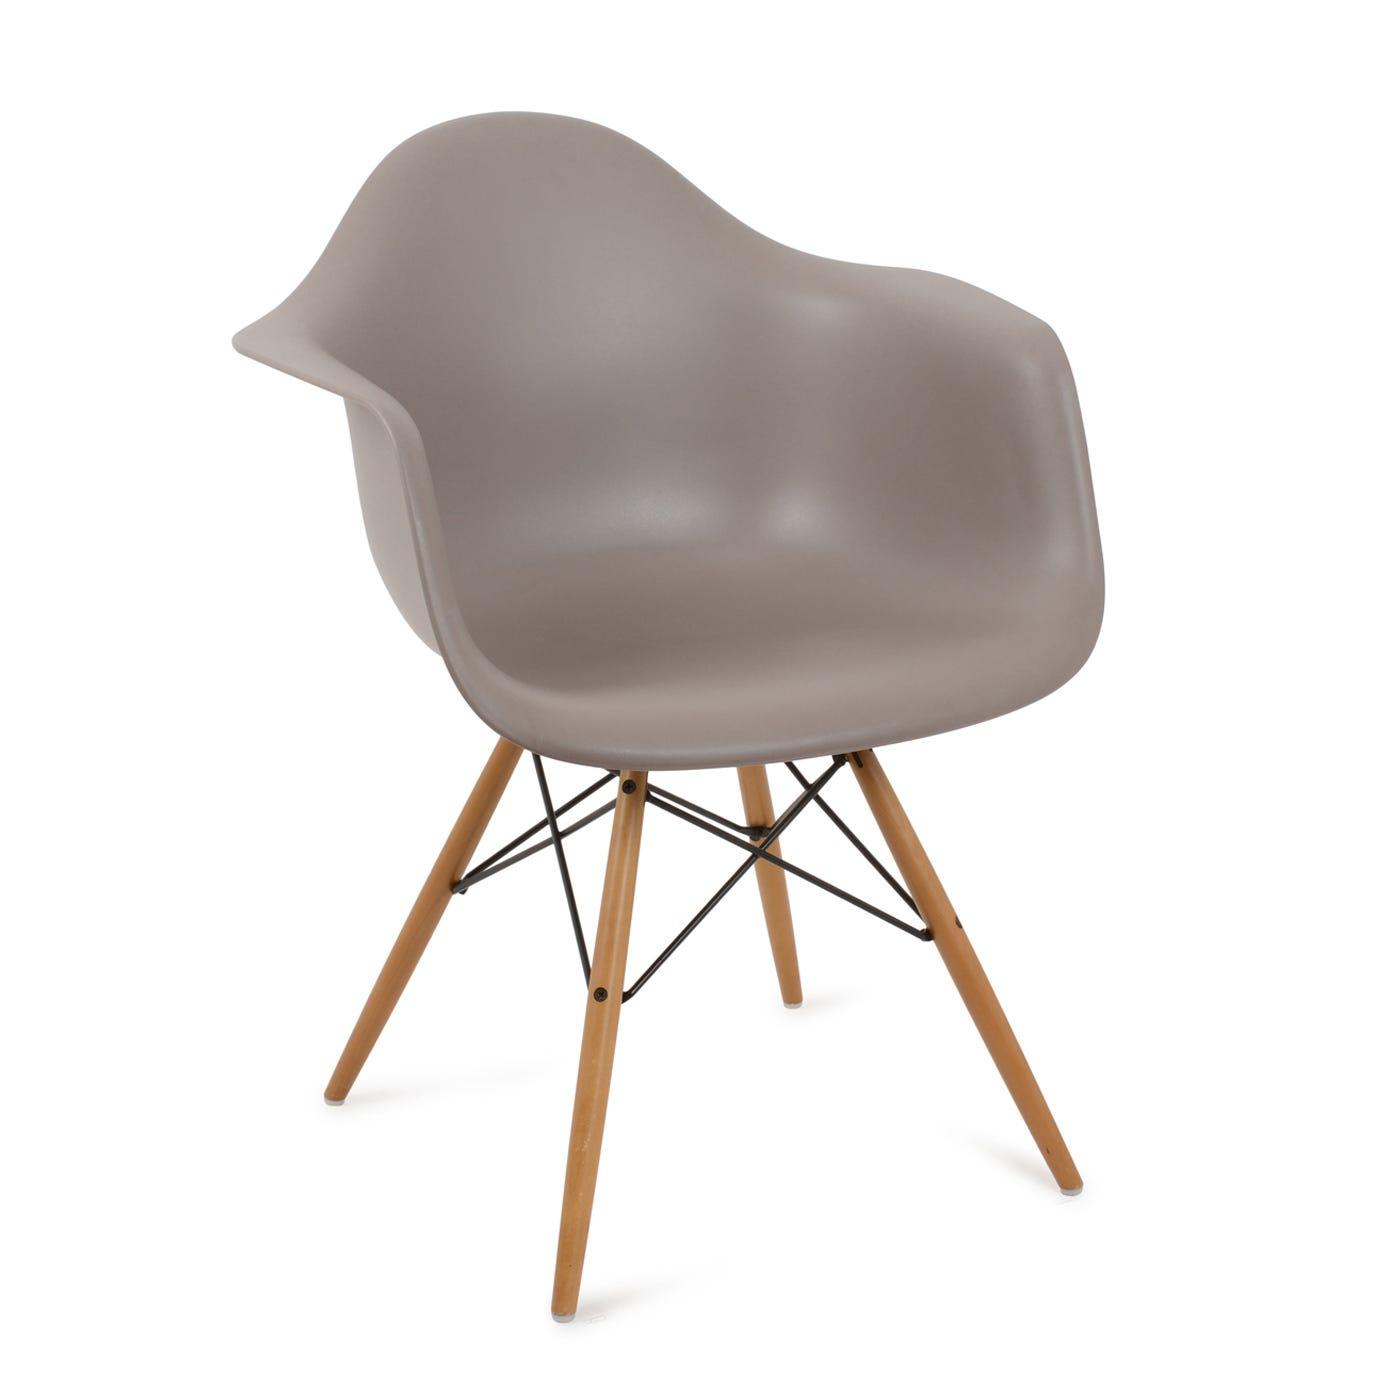 Eames DAW Armchair New Height Mauve Grey Light Maple Legs